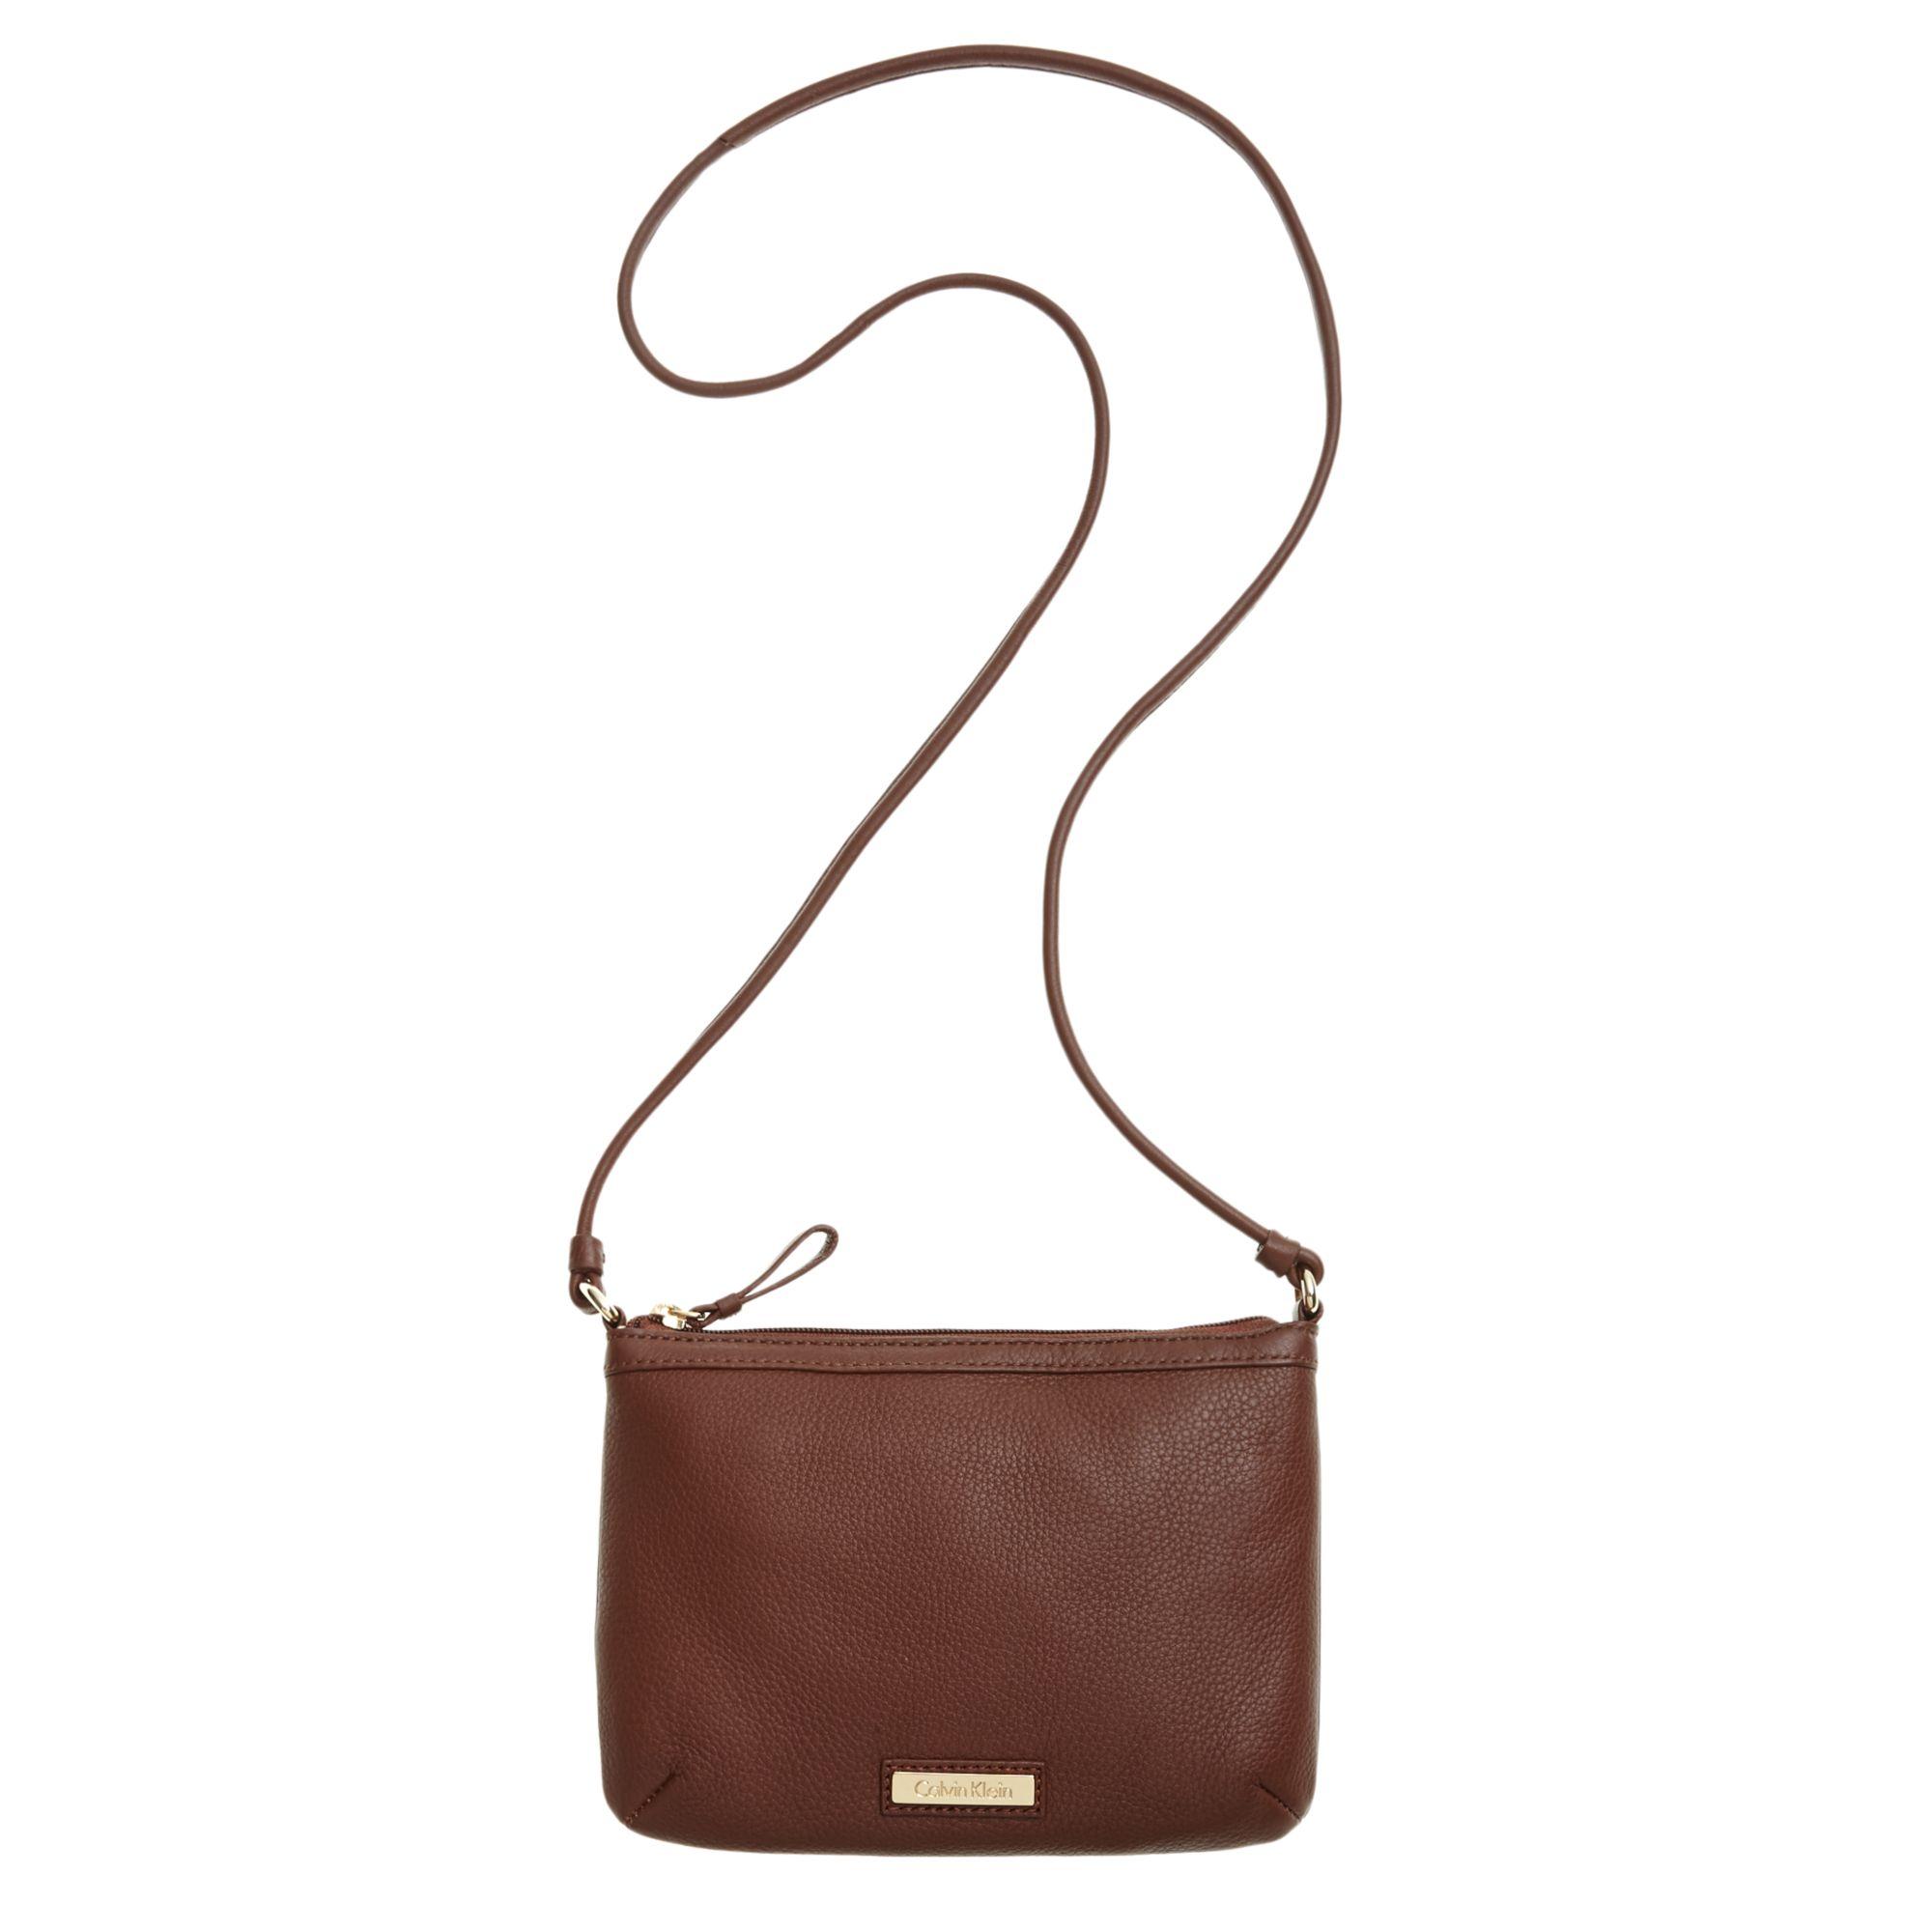 bd4611d0c4ec Lyst - Calvin Klein Key Items Pebble Leather Crossbody in Brown